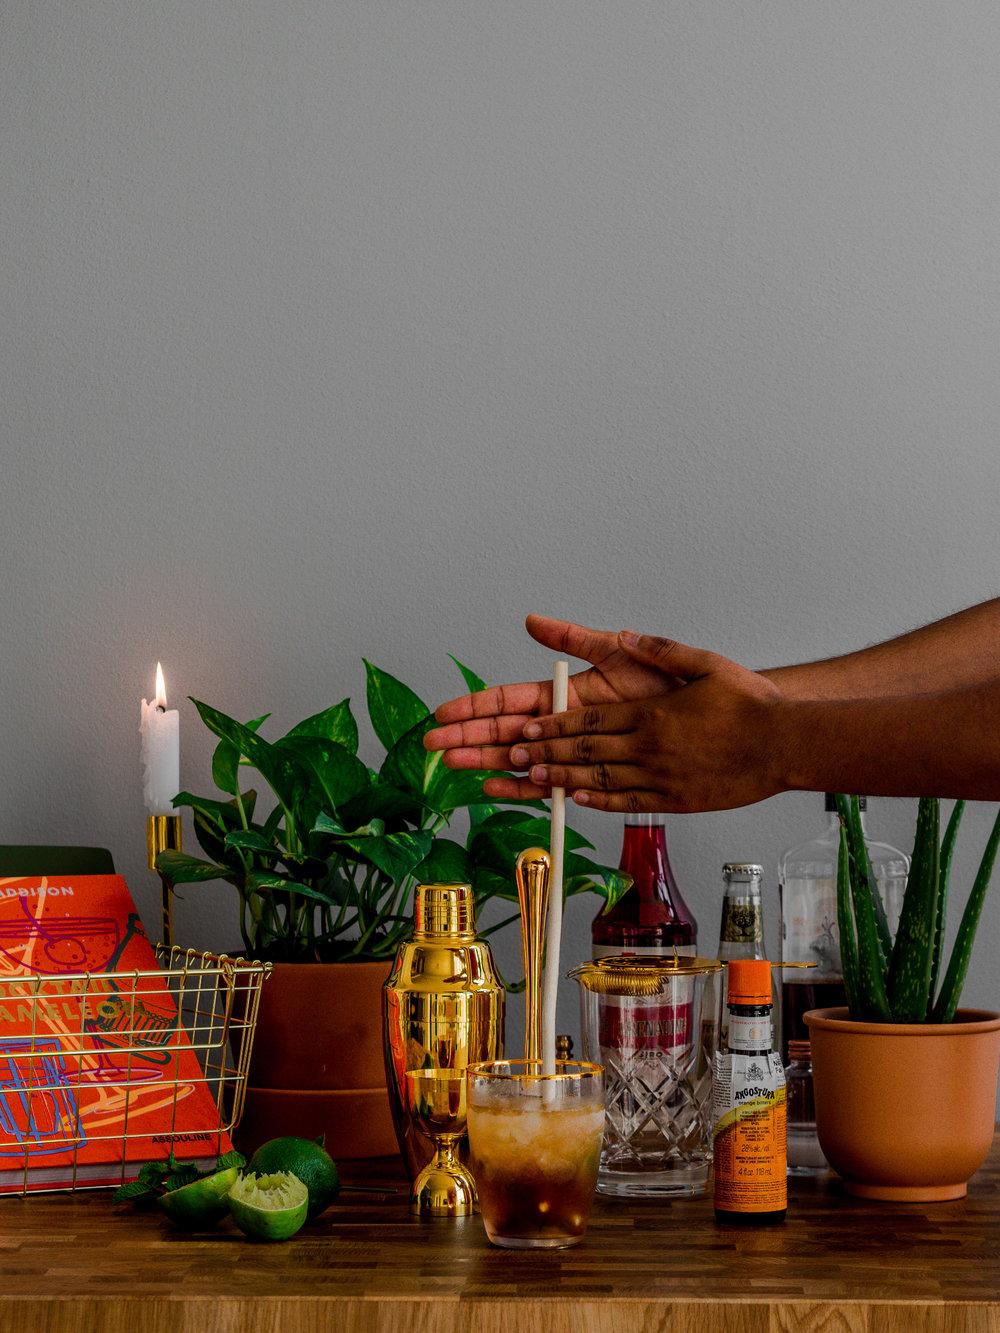 abhishek-dekate-angostura-bitters-queens-park-swizzle-cocktail